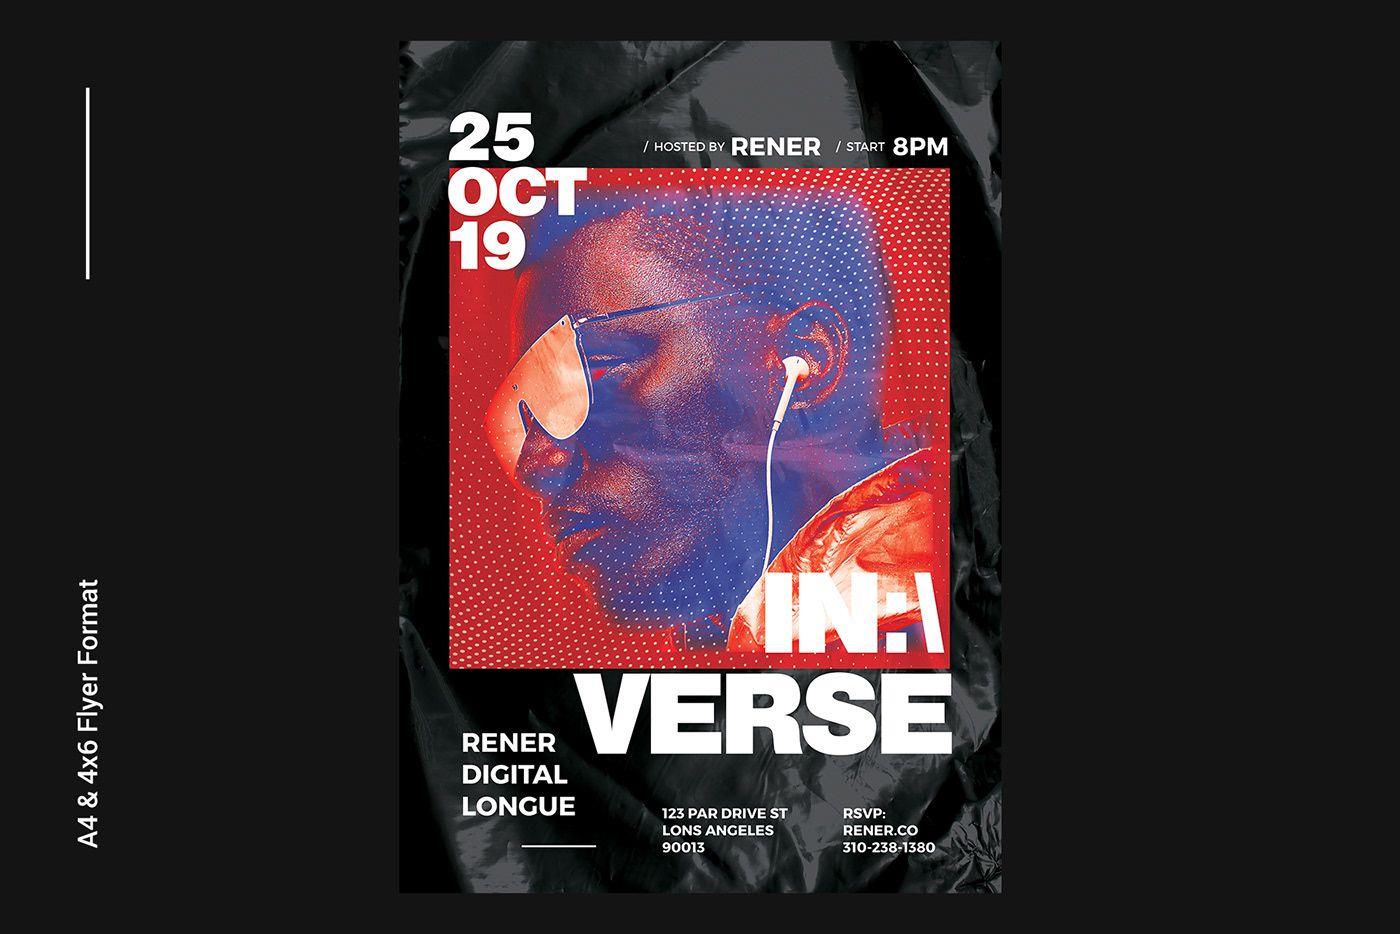 004 Wonderful Hip Hop Flyer Template Sample  Templates Hip-hop Party Free DownloadFull